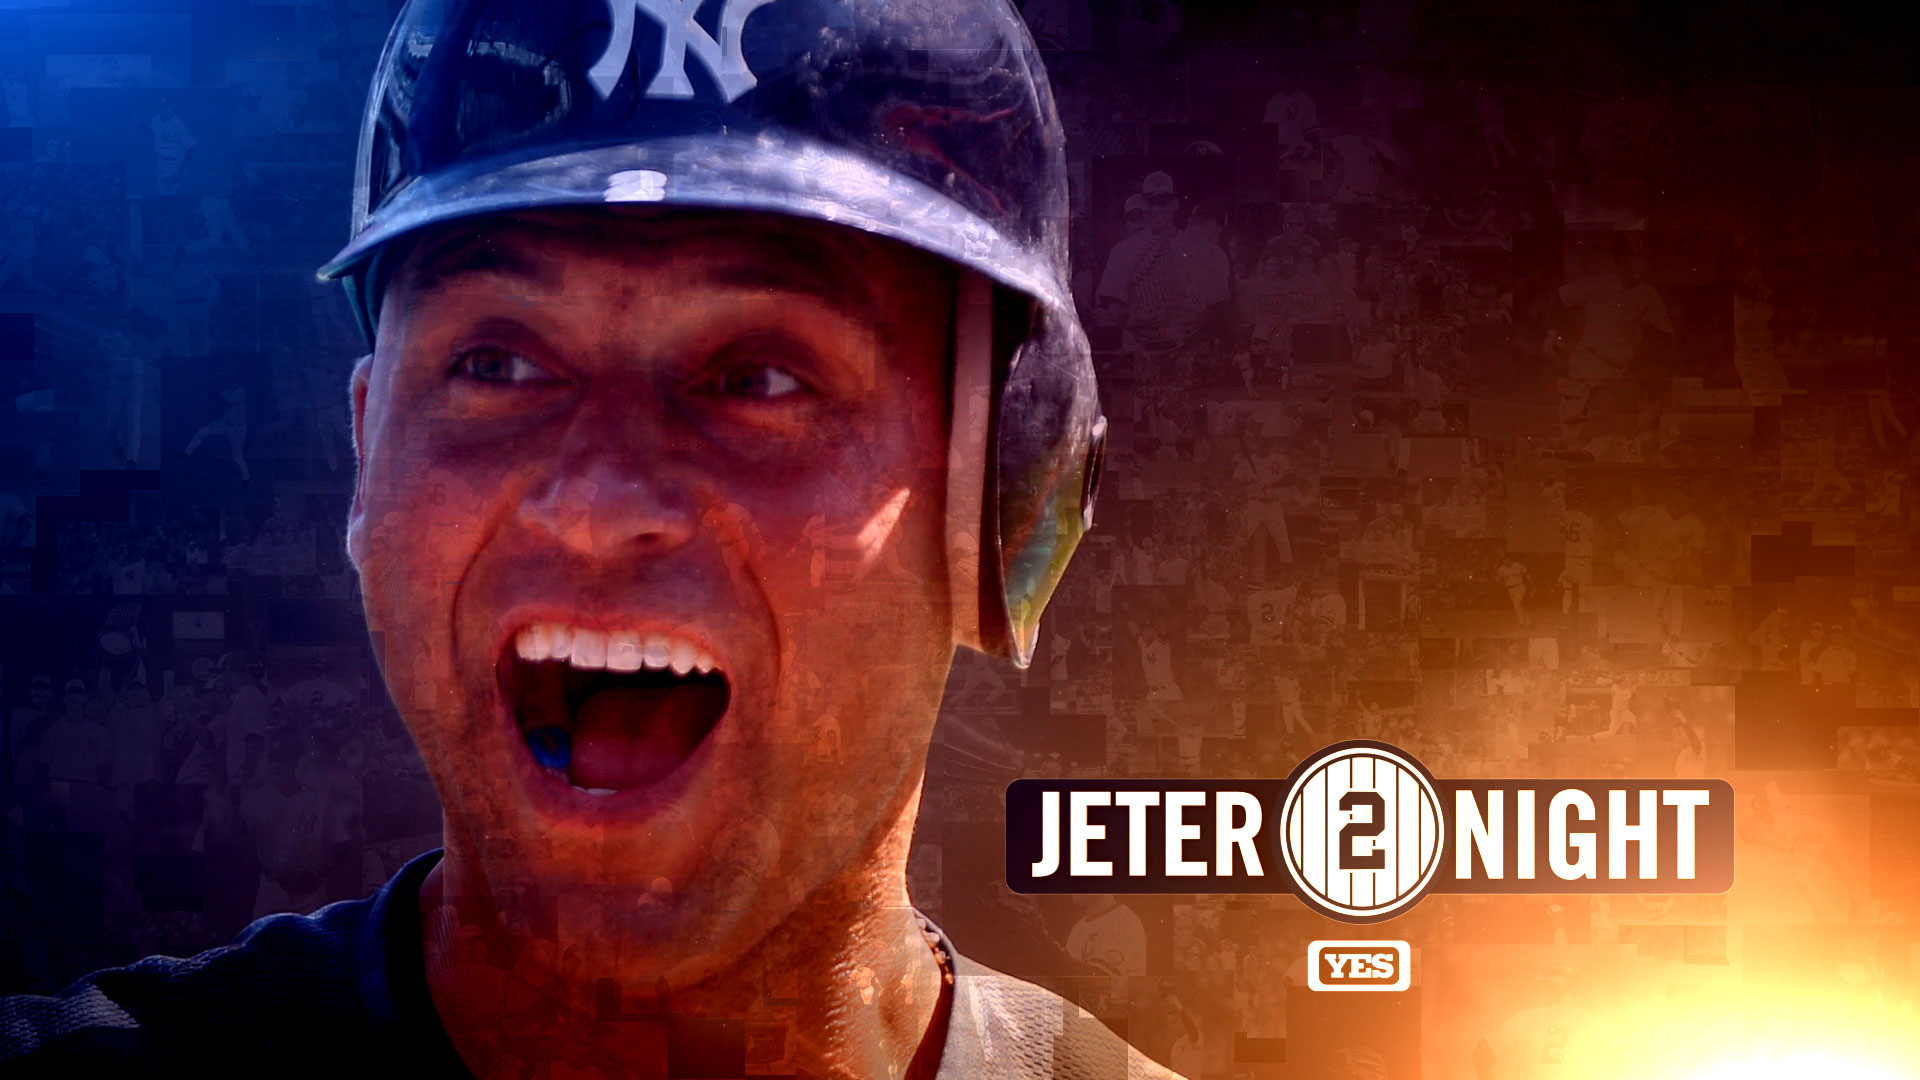 Jeter_Week_Studio_Graphic_06 (00089).jpg